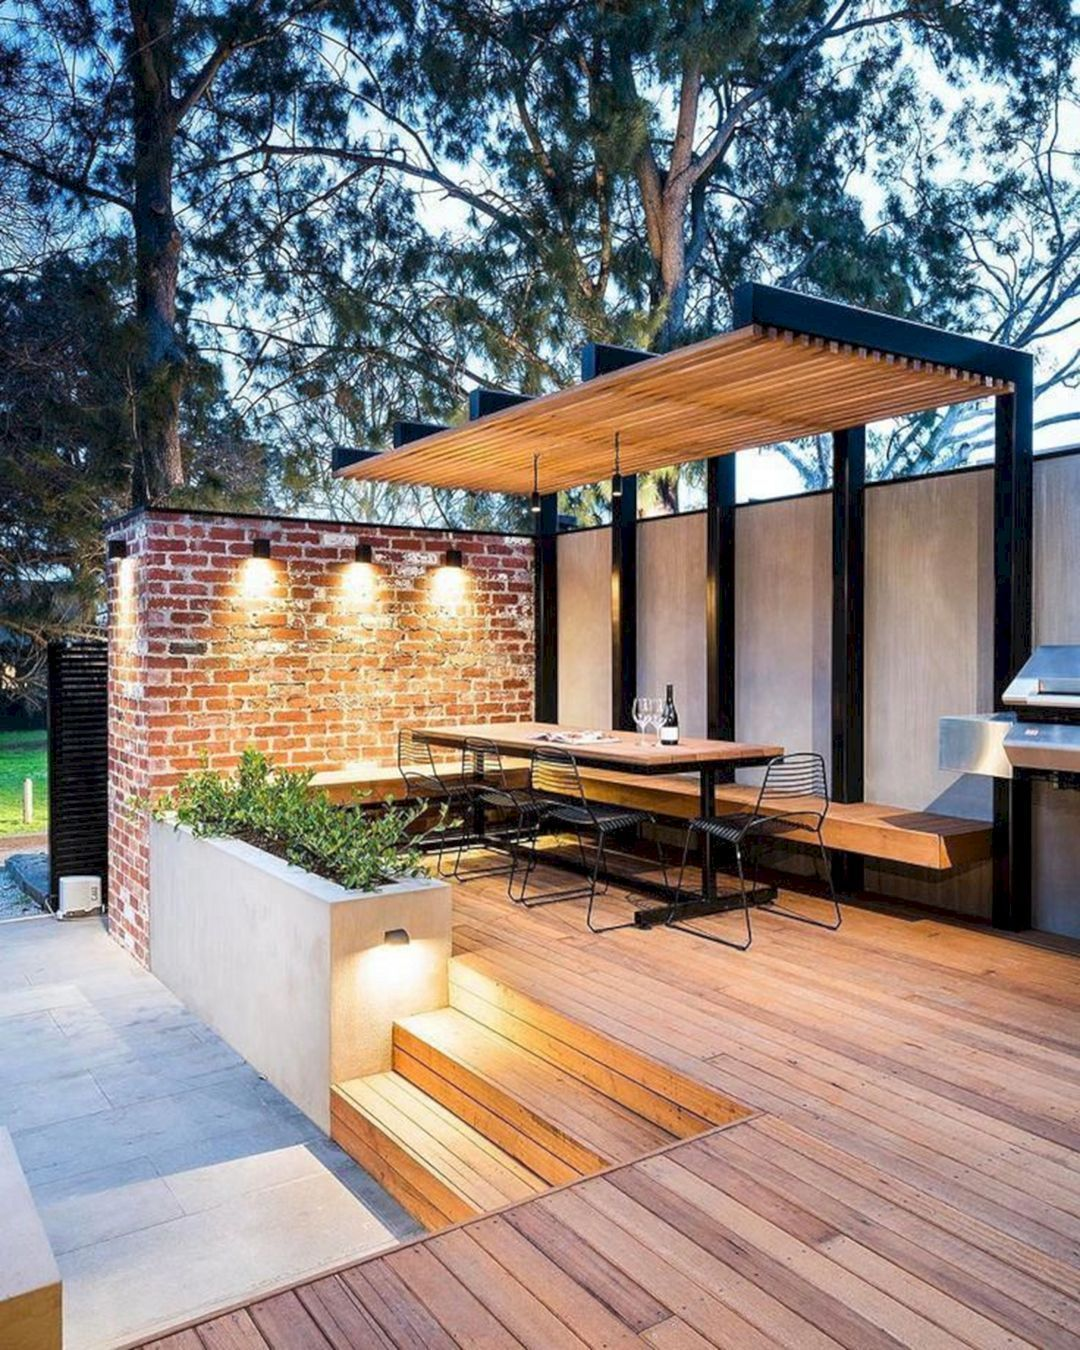 15 Modern Deck Patio Ideas For Backyard Design And Decoration Ideas Design Decor Pergola Patio Backyard Design Backyard Pergola Backyard modern pergola ideas